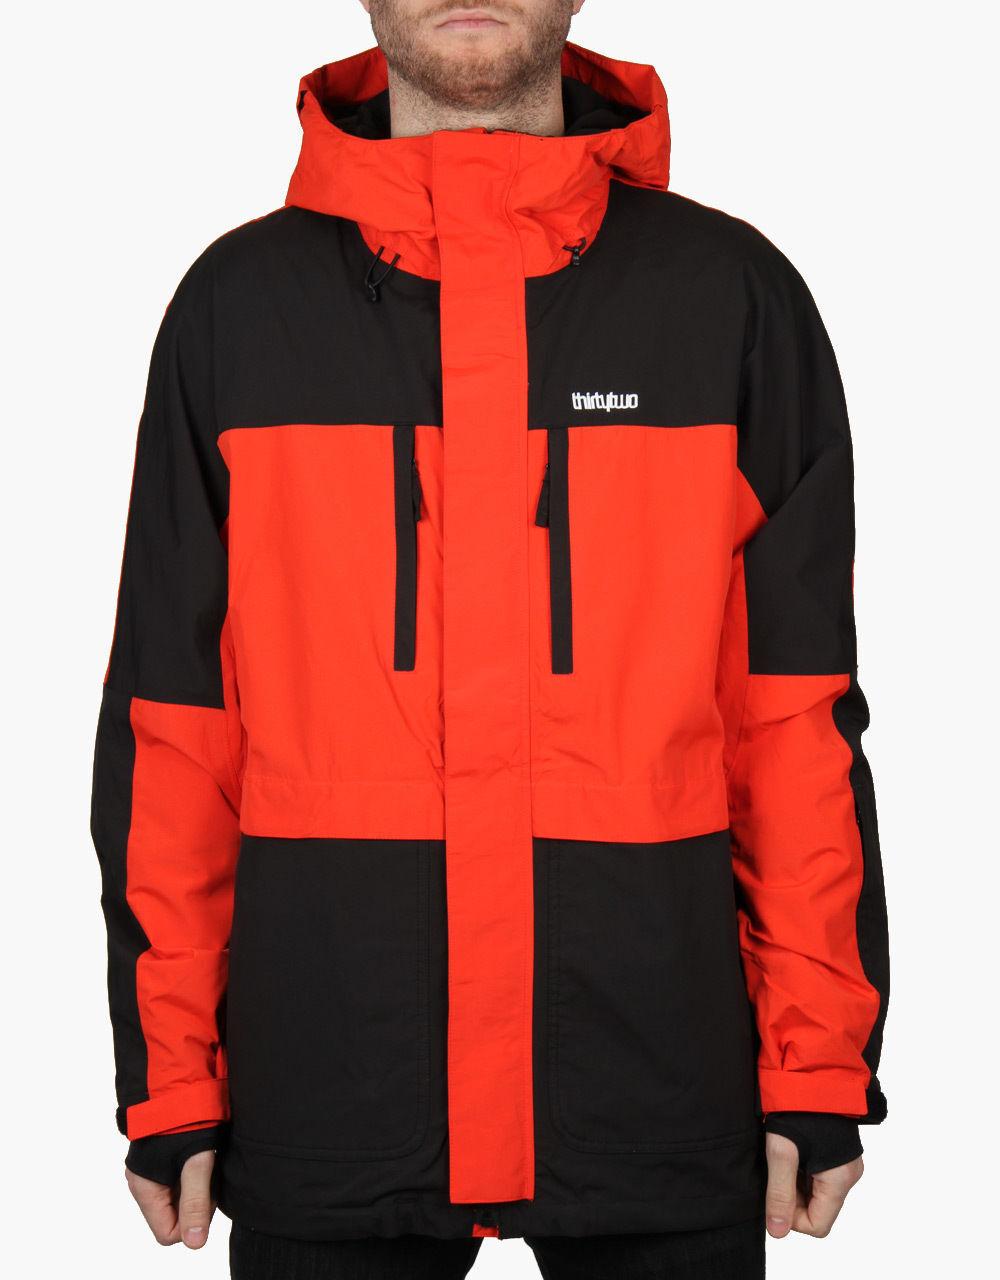 2016 Nwt Uomo Thirtytwo Blythe Giacca da Snowboard Mandarino Arancione 2L